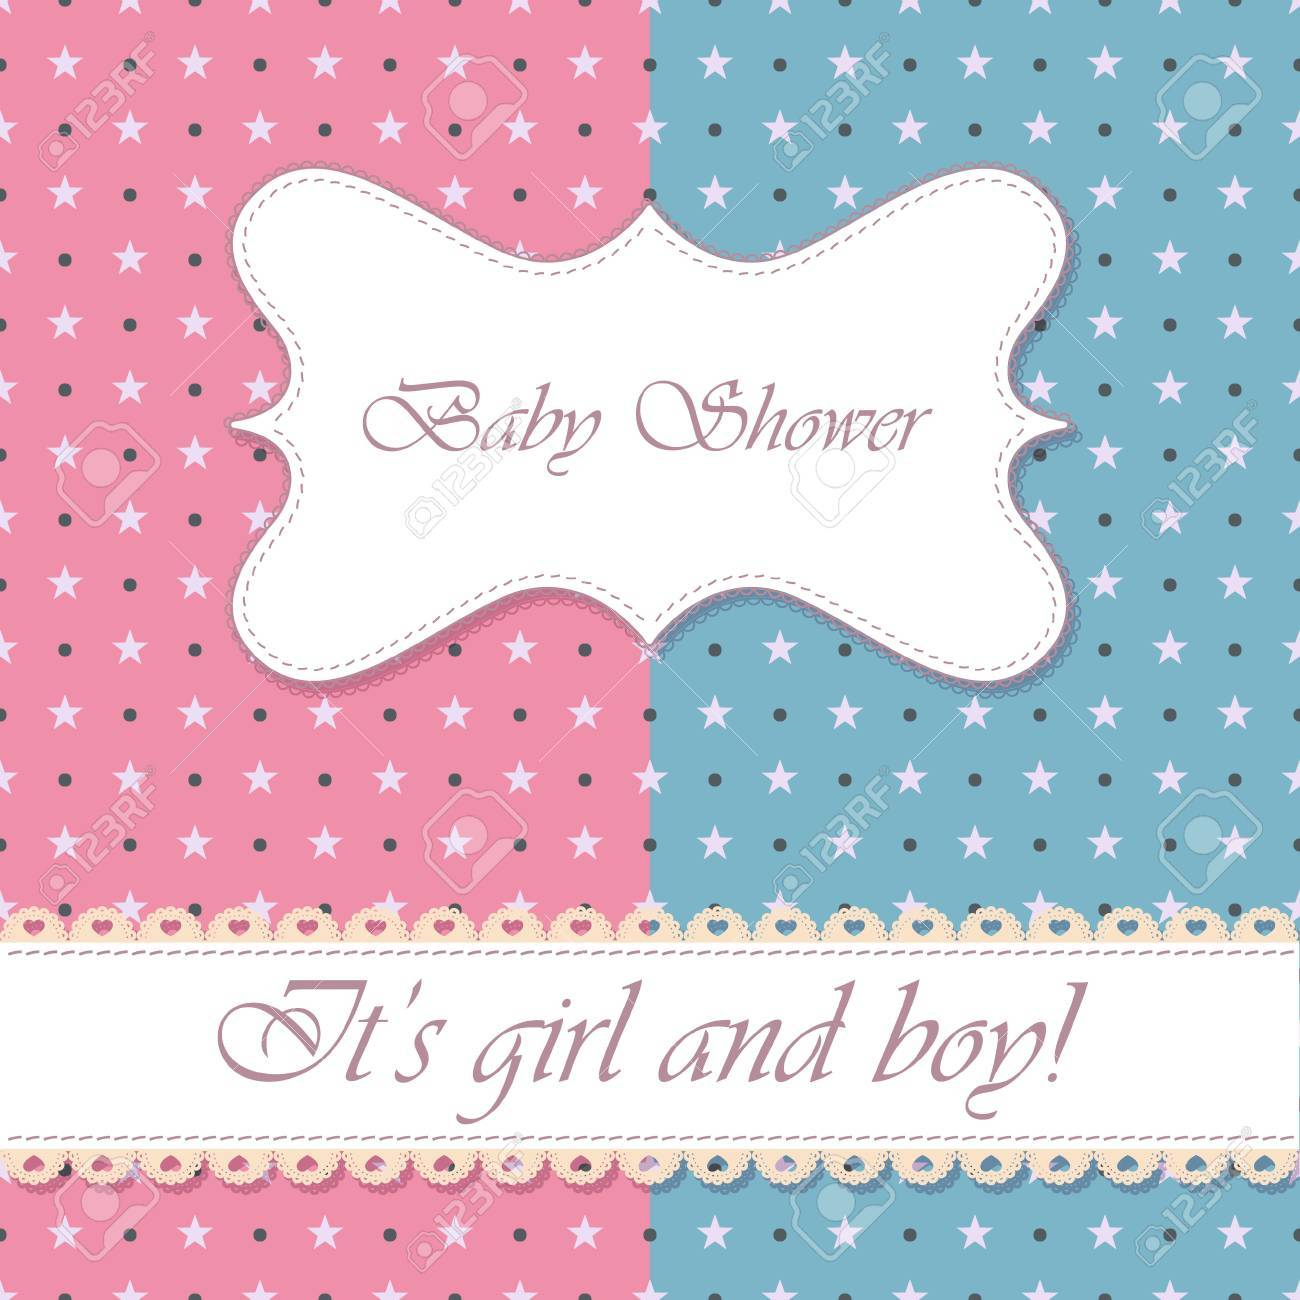 Vector Polka Dot Baby Shower Girl And Boy Vintage Royalty Free